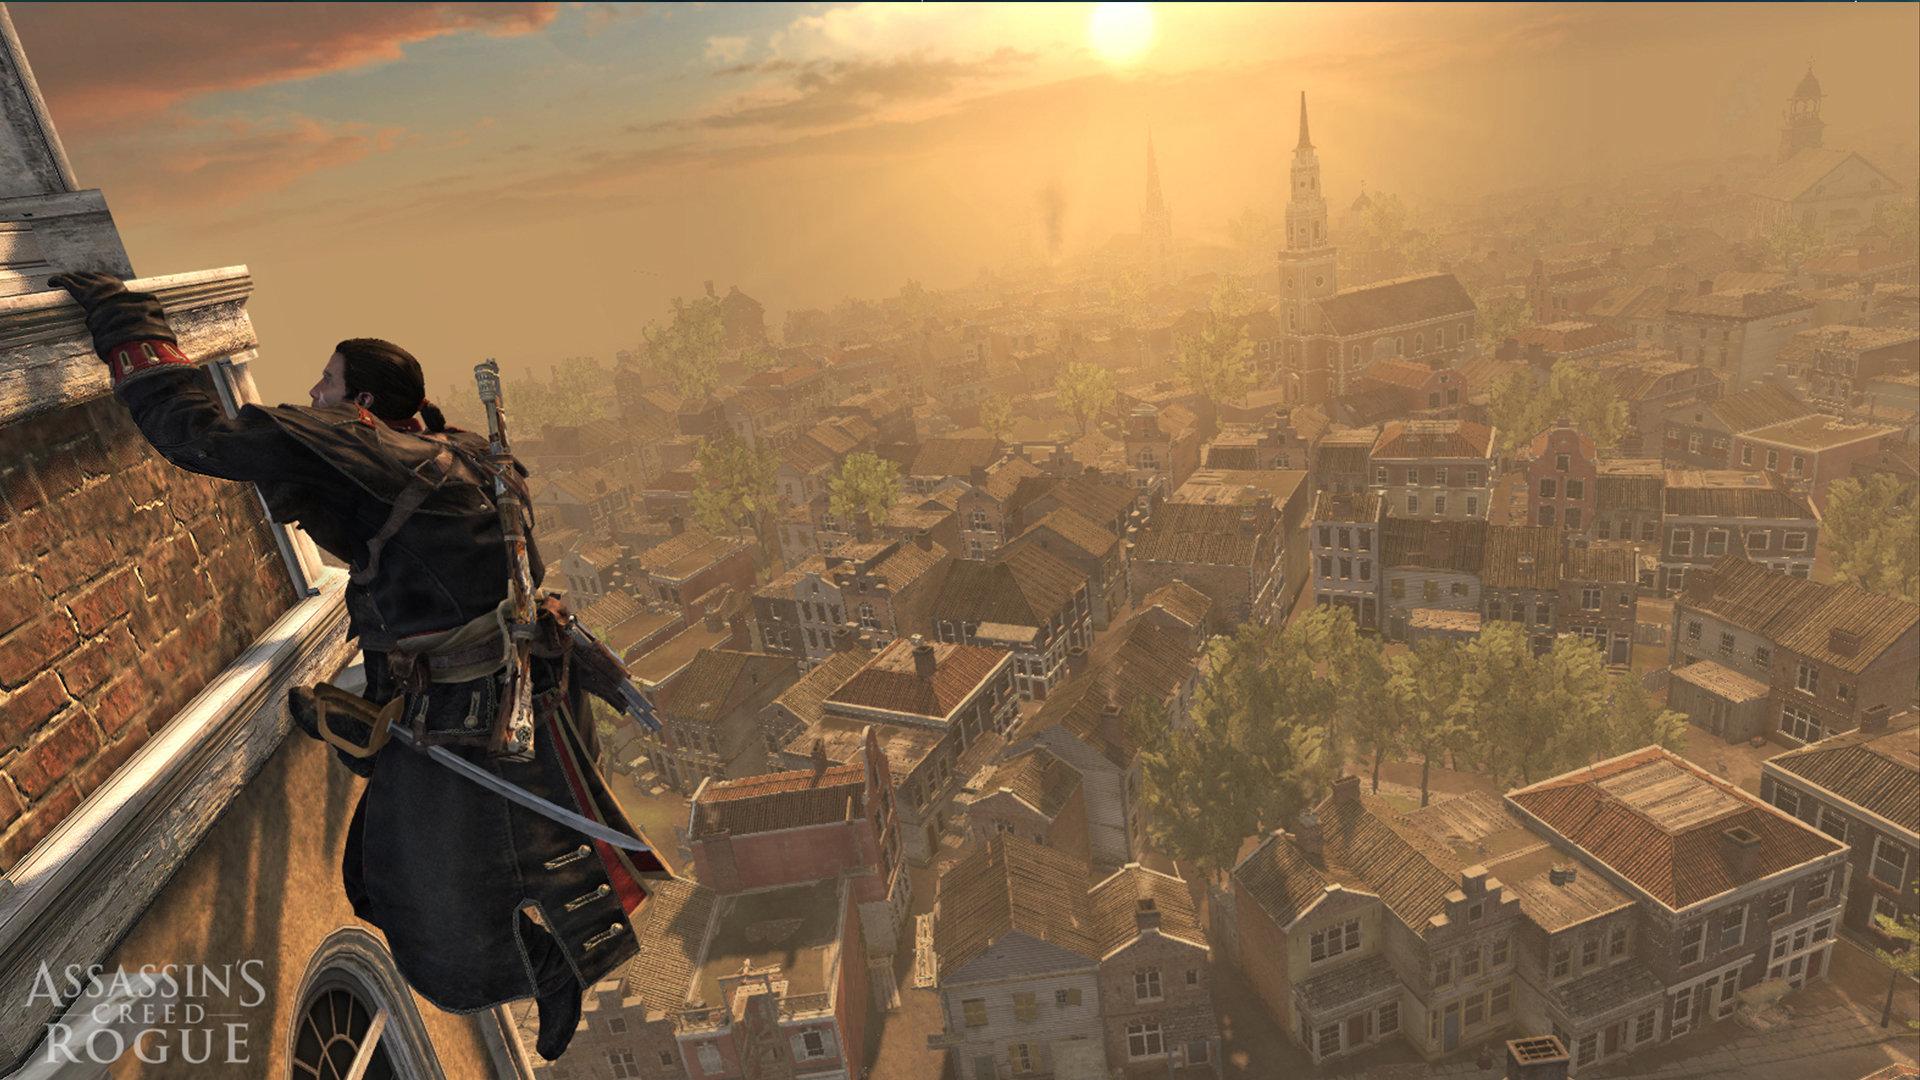 Free Download Assassin S Creed Rogue Wallpaper Id 231509 Hd